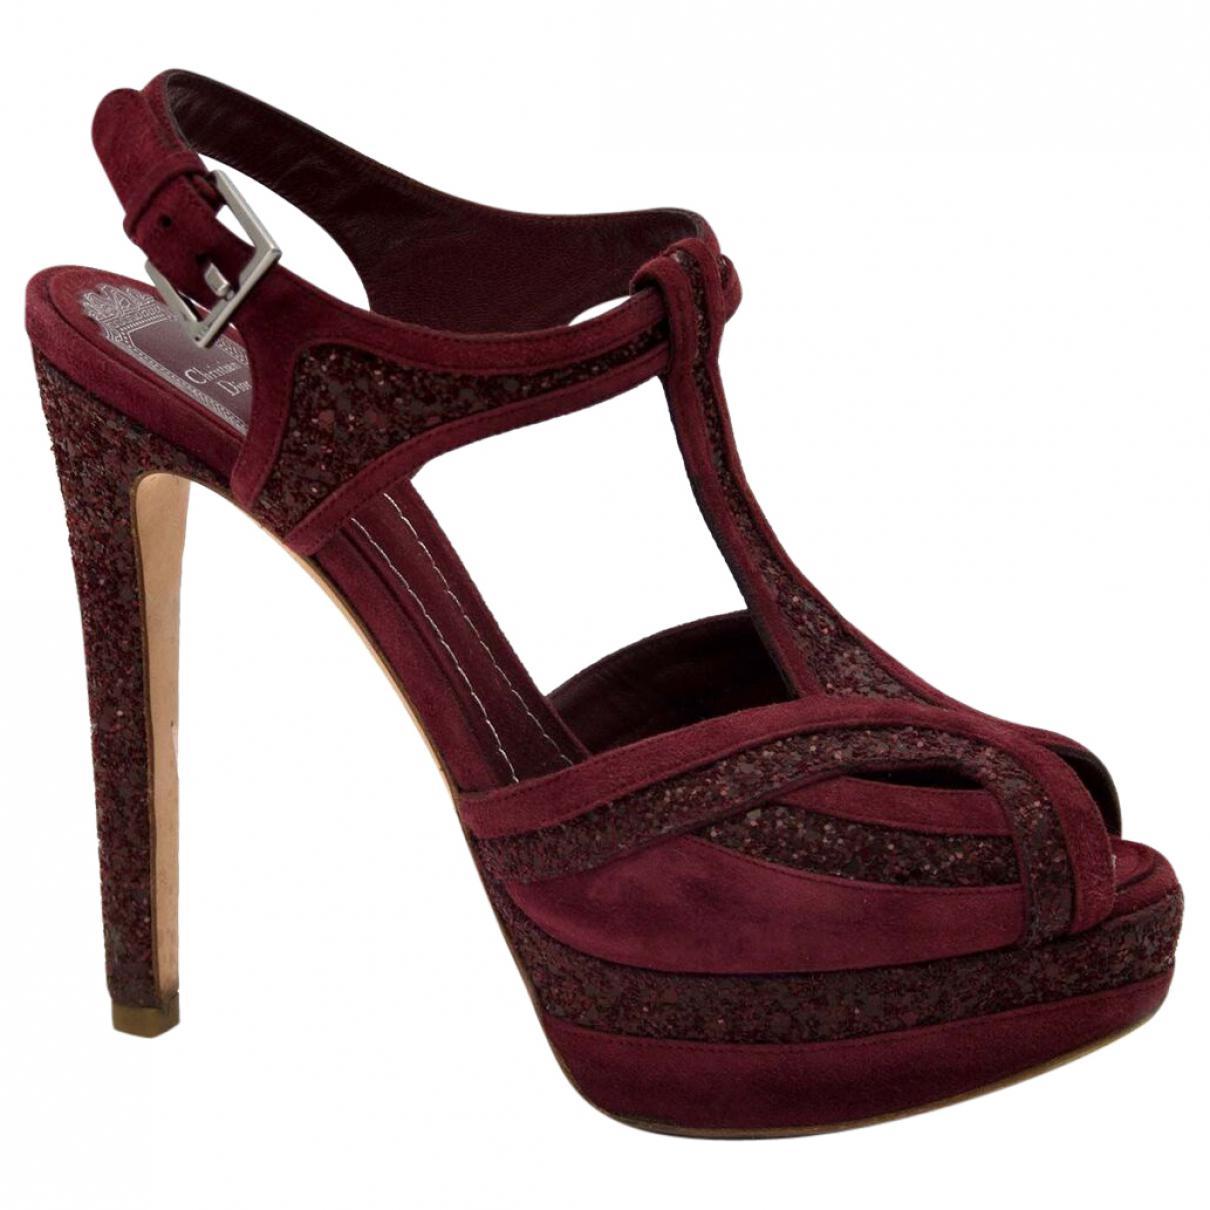 Pre-owned - Brown Suede Sandals Dior kgDcvIt23